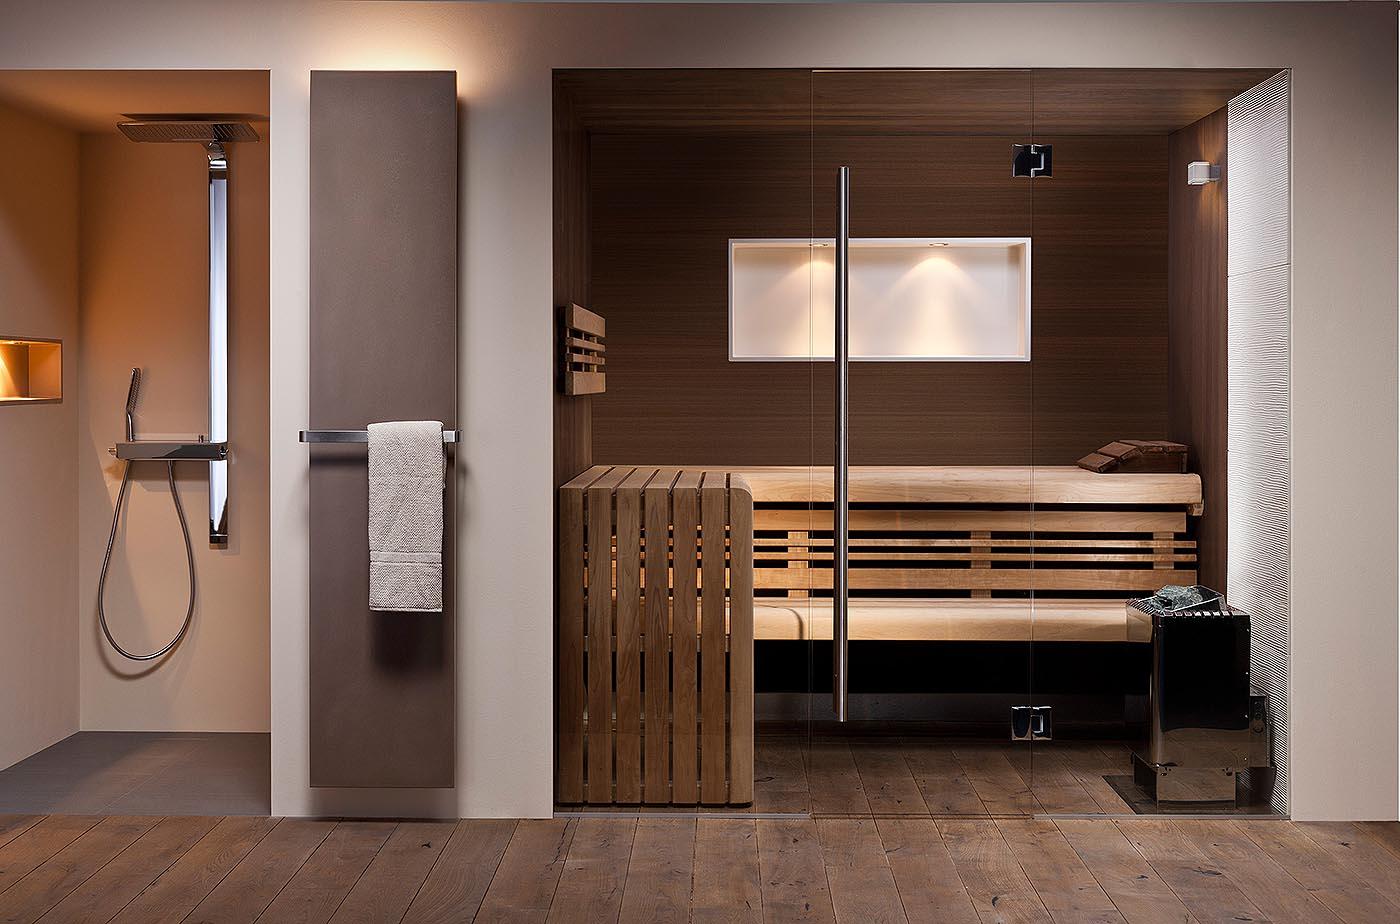 https://www.badratgeber.com/wp-content/uploads/2020/12/Design-Sauna-zuhause-corso-sommerhuber-1.jpg